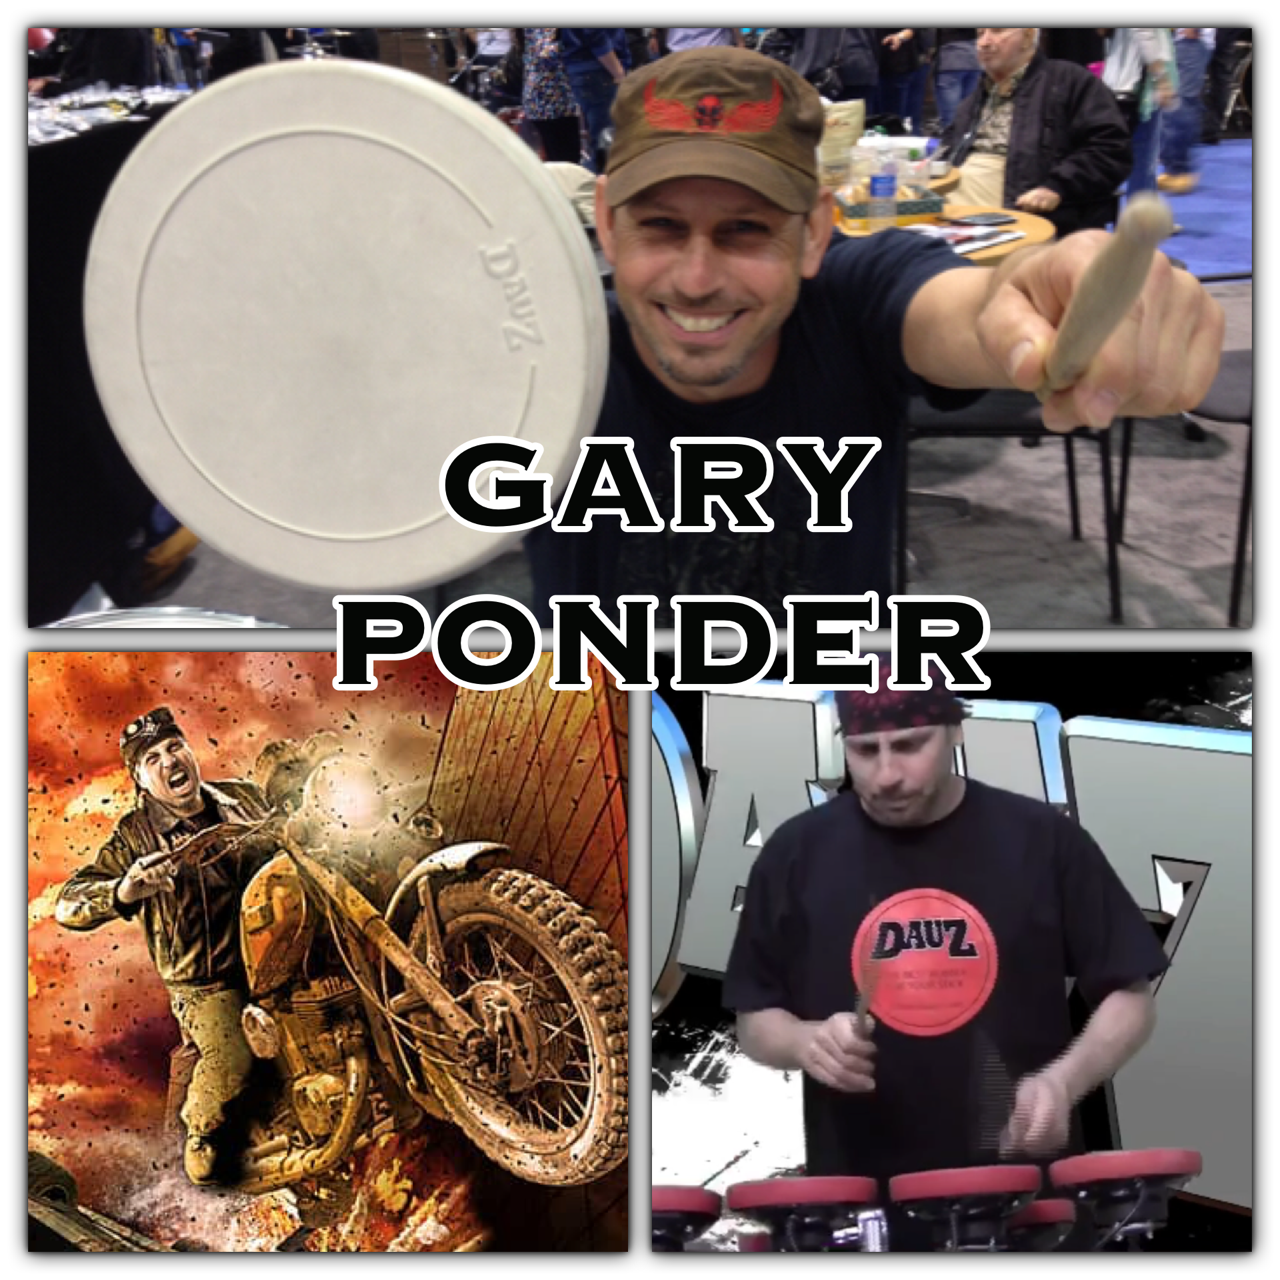 GARY PONDER